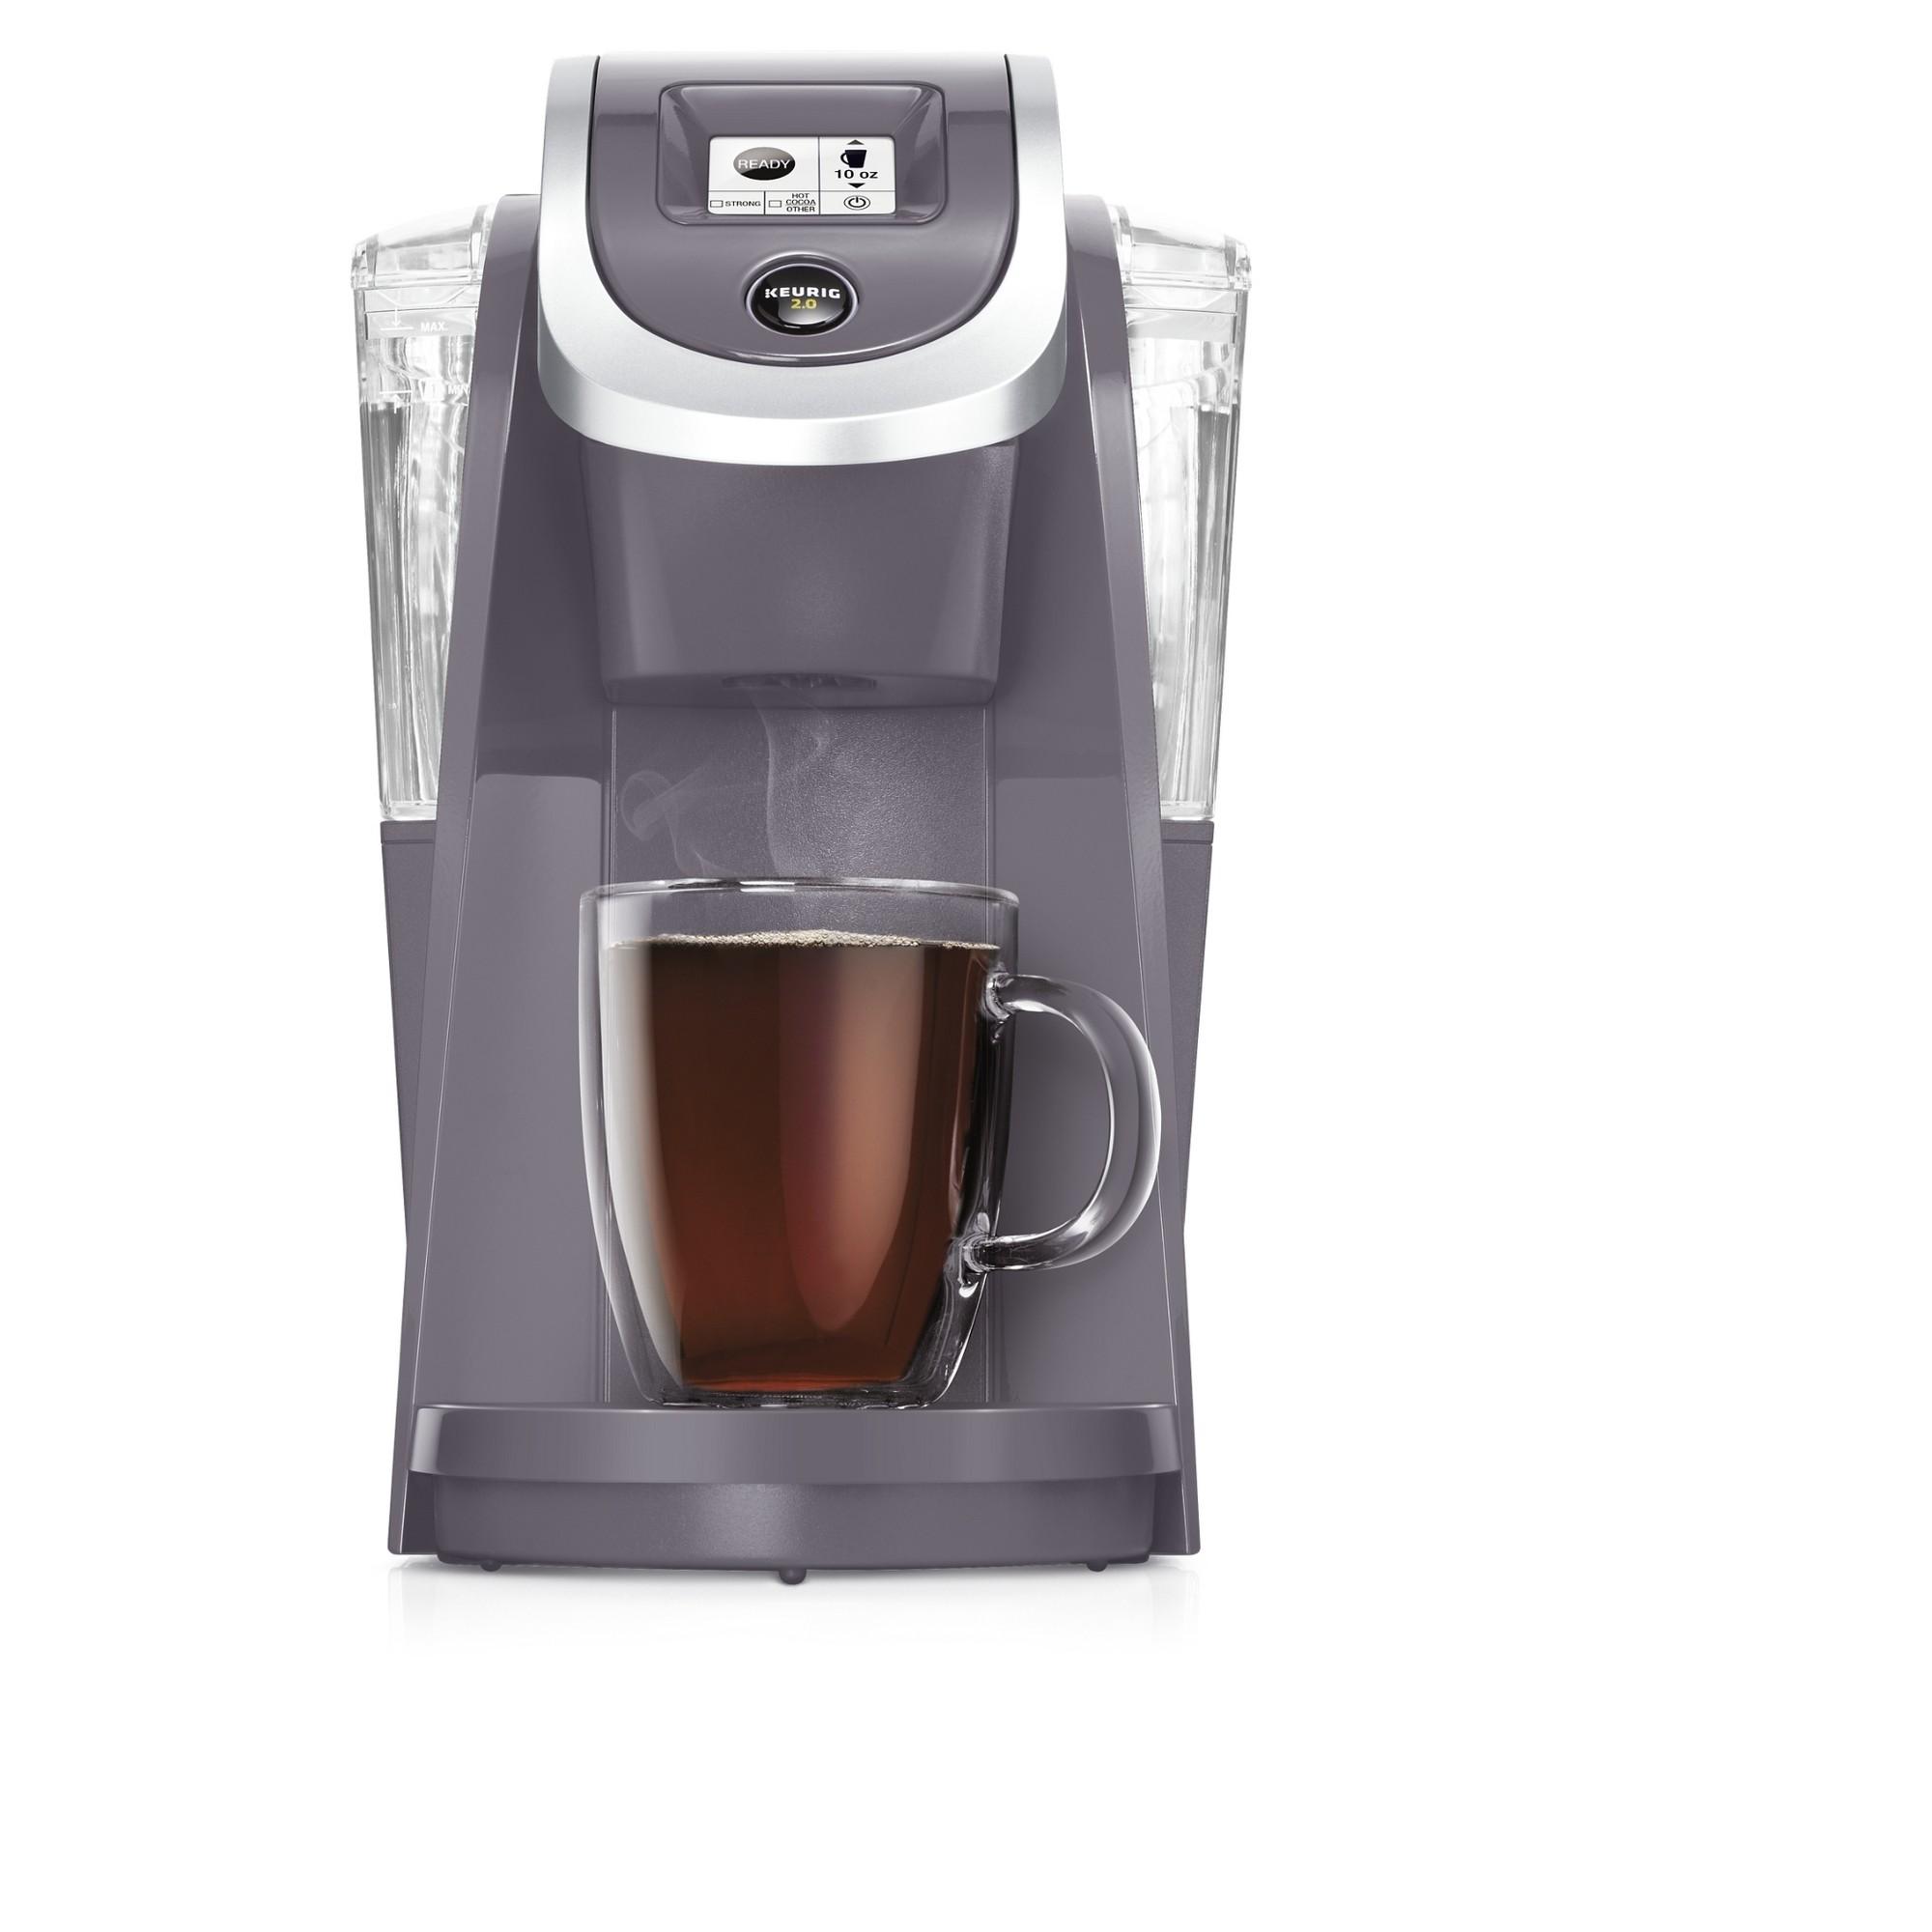 Keurig K200 Plum Gray Single Serve Coffee Maker Products